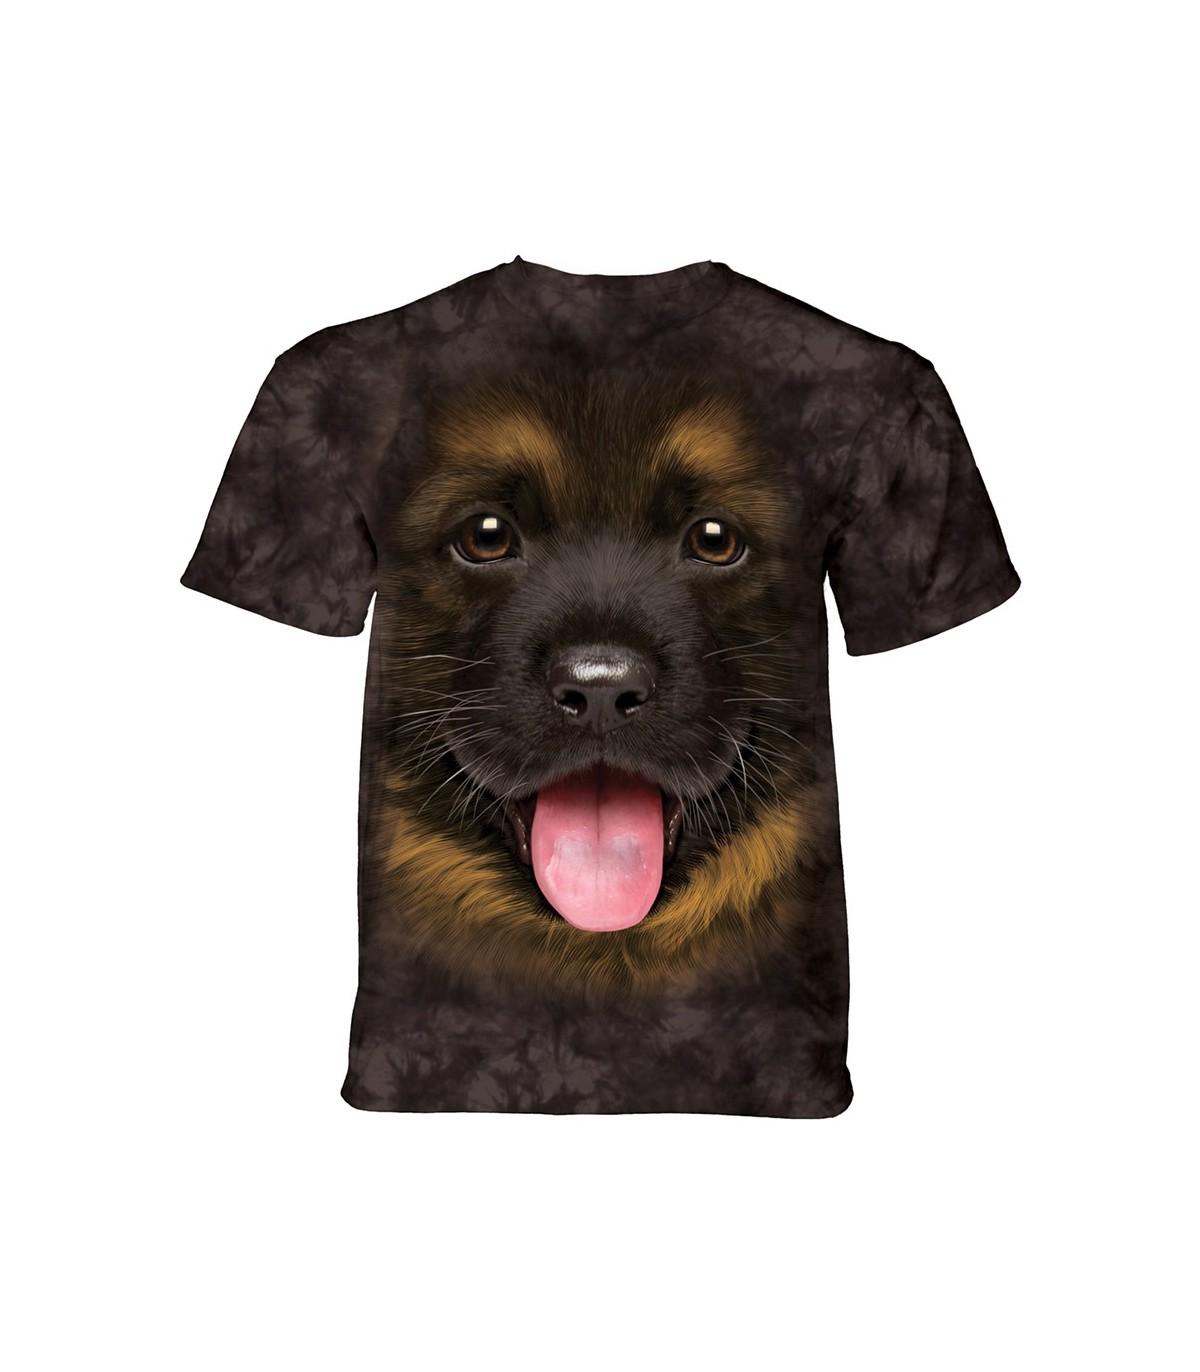 Dog Is Love Animal T Shirt Child Unisex The Mountain